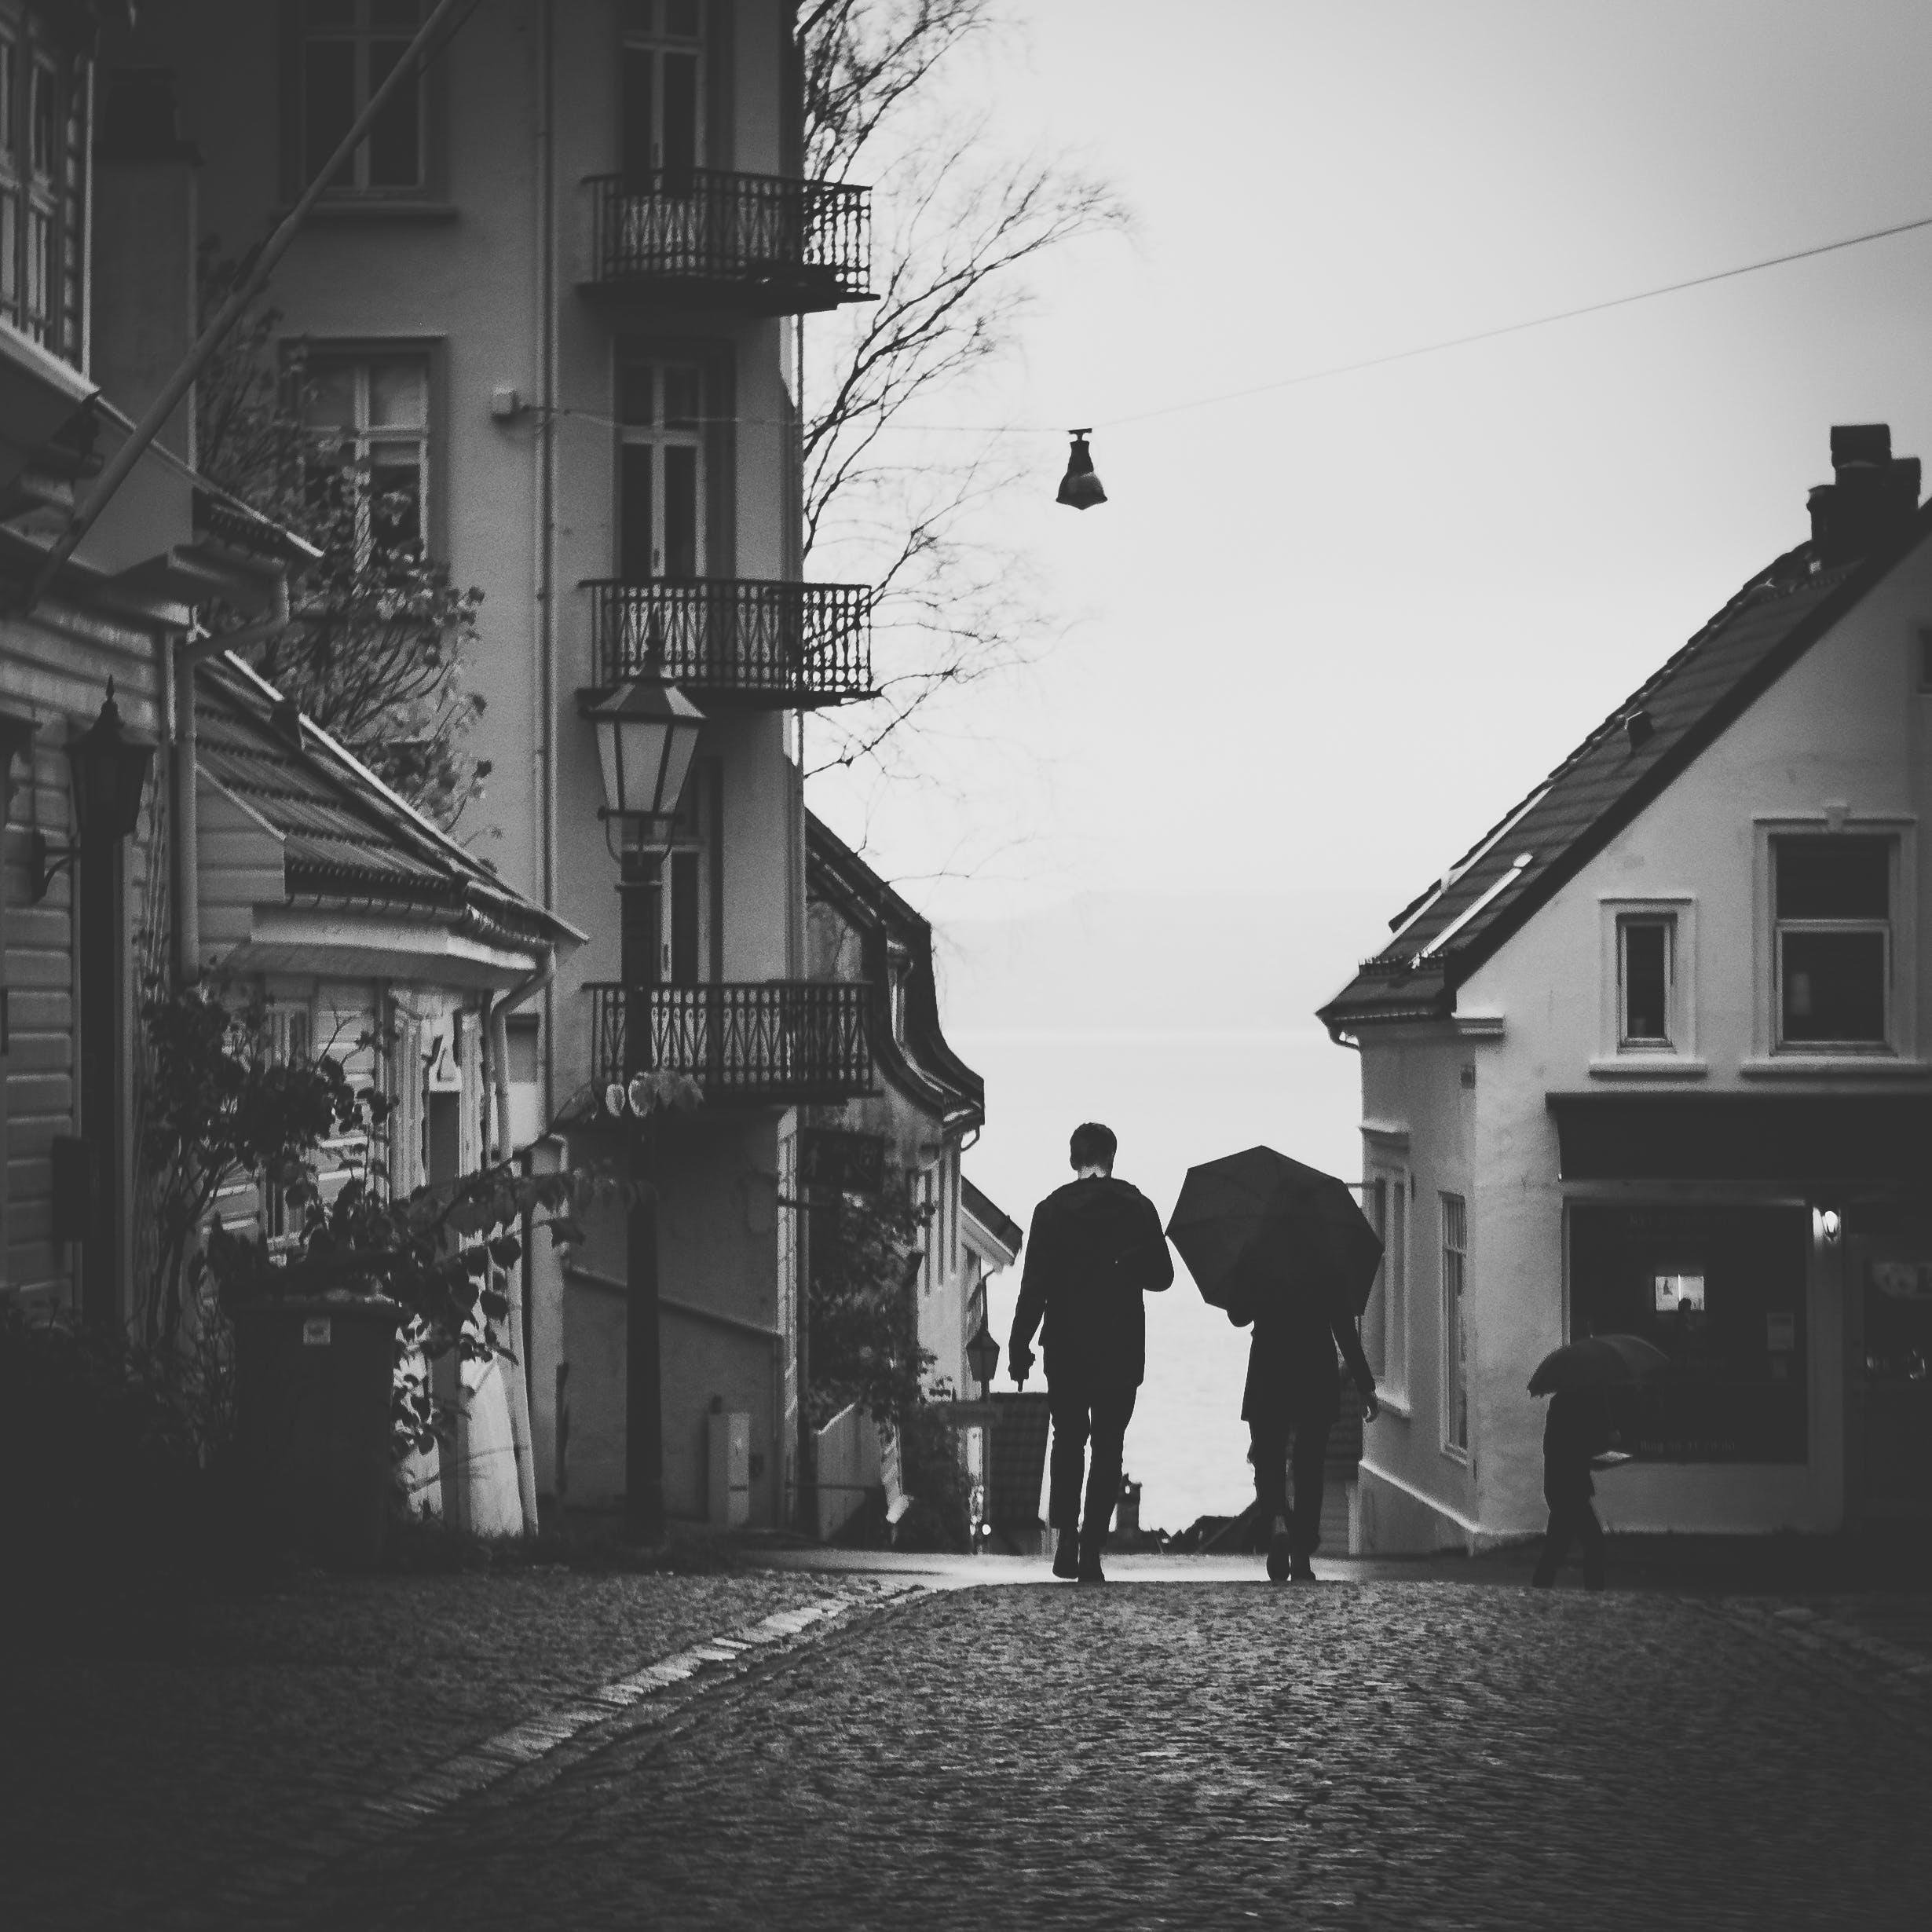 Grayscale Photo Of Man Beside Woman Under Umbrella Walking On Pavement